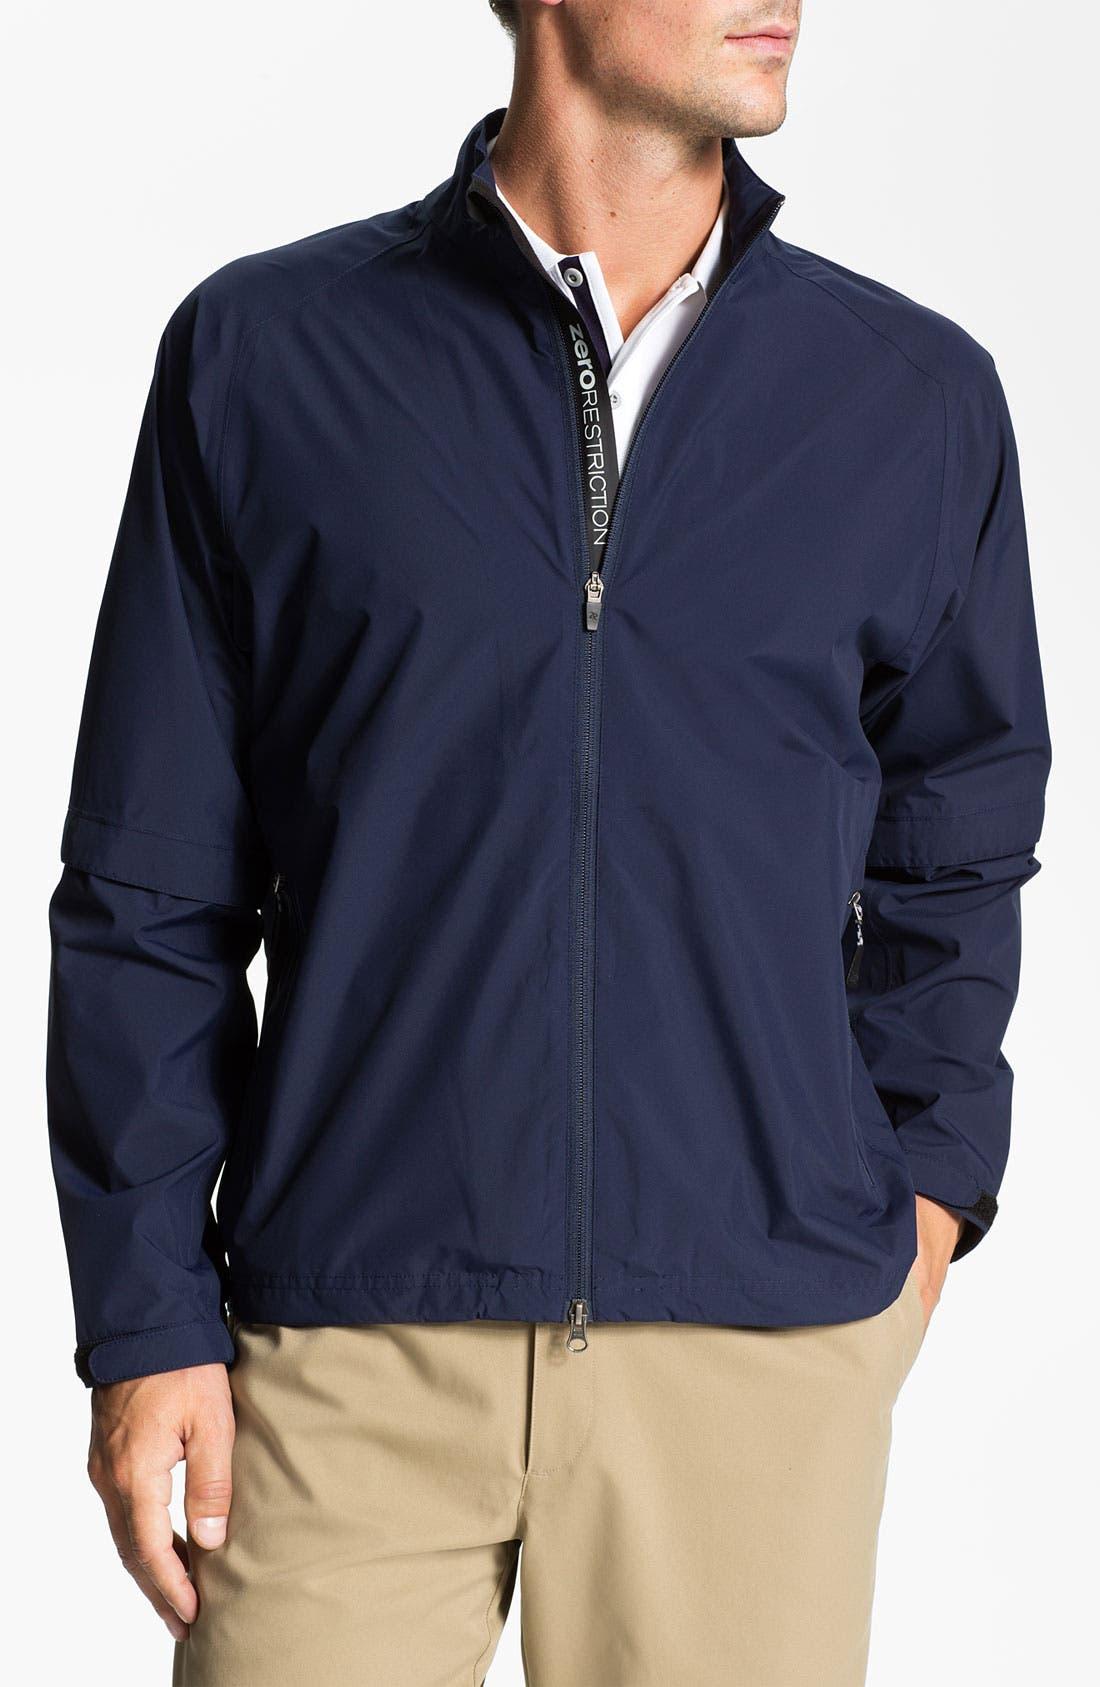 Main Image - Zero Restriction Packable Jacket